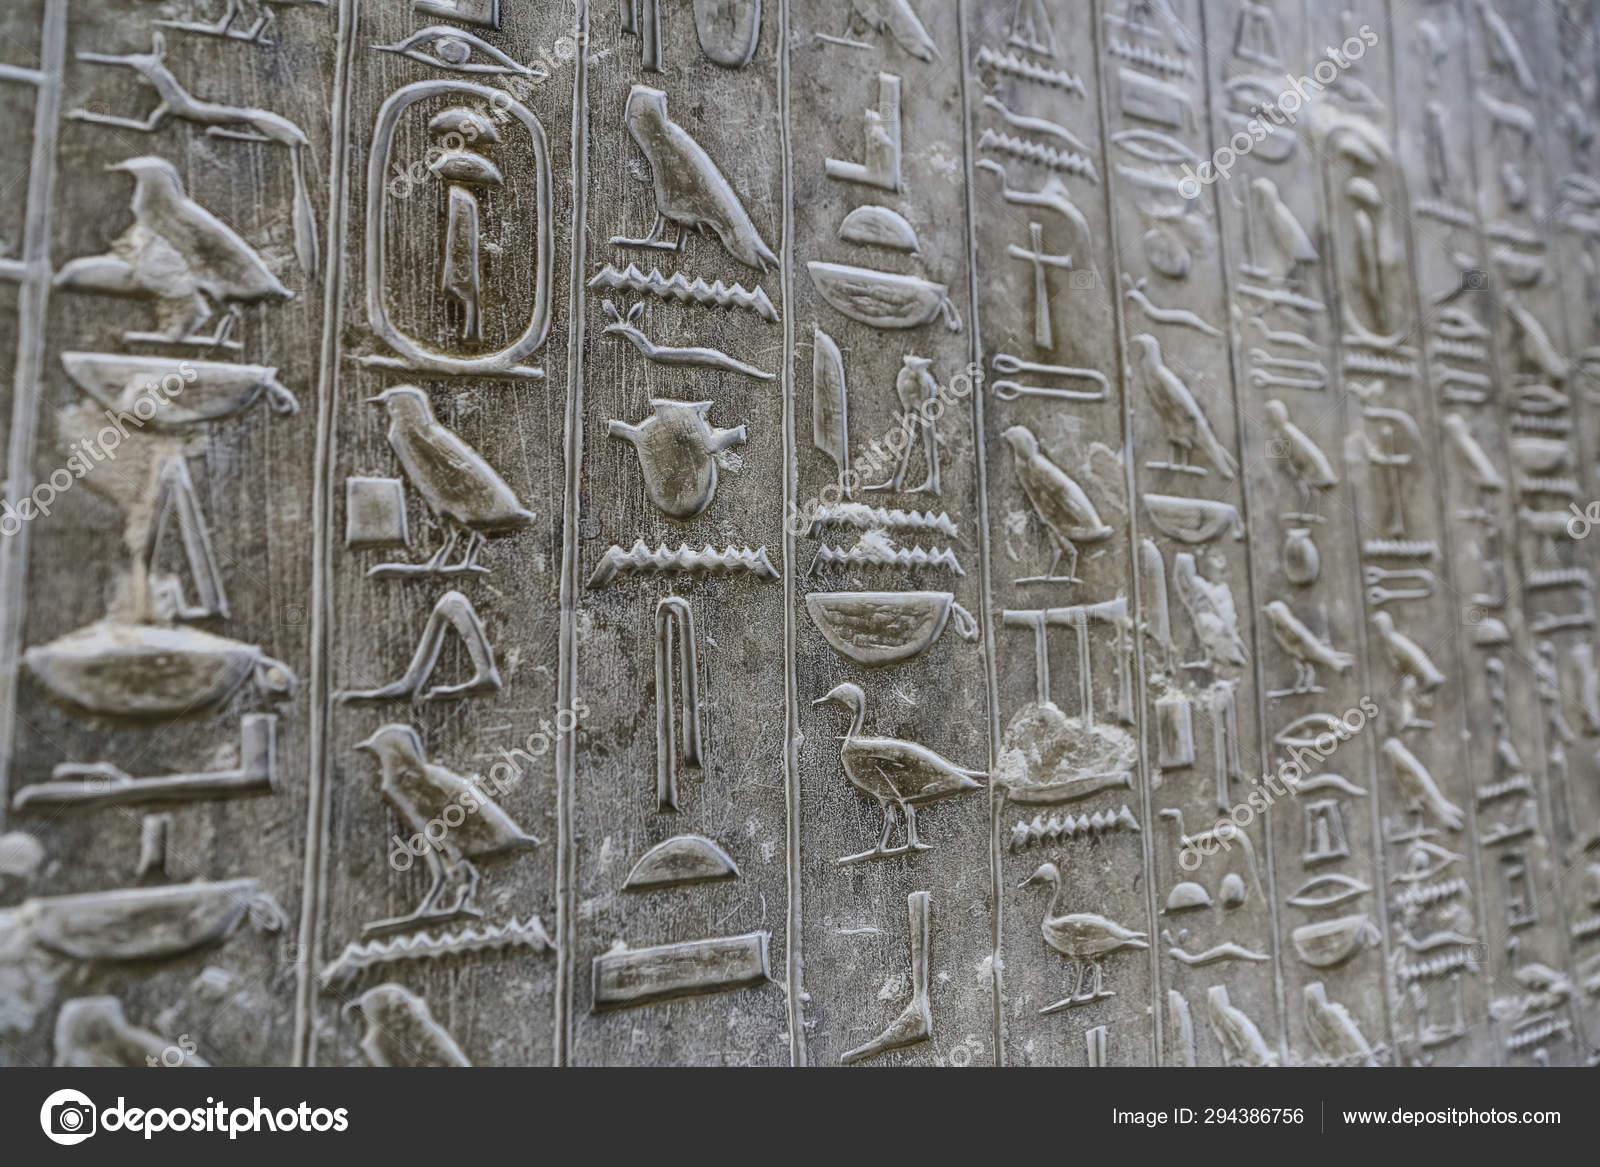 The pyramid texts pdf viewer